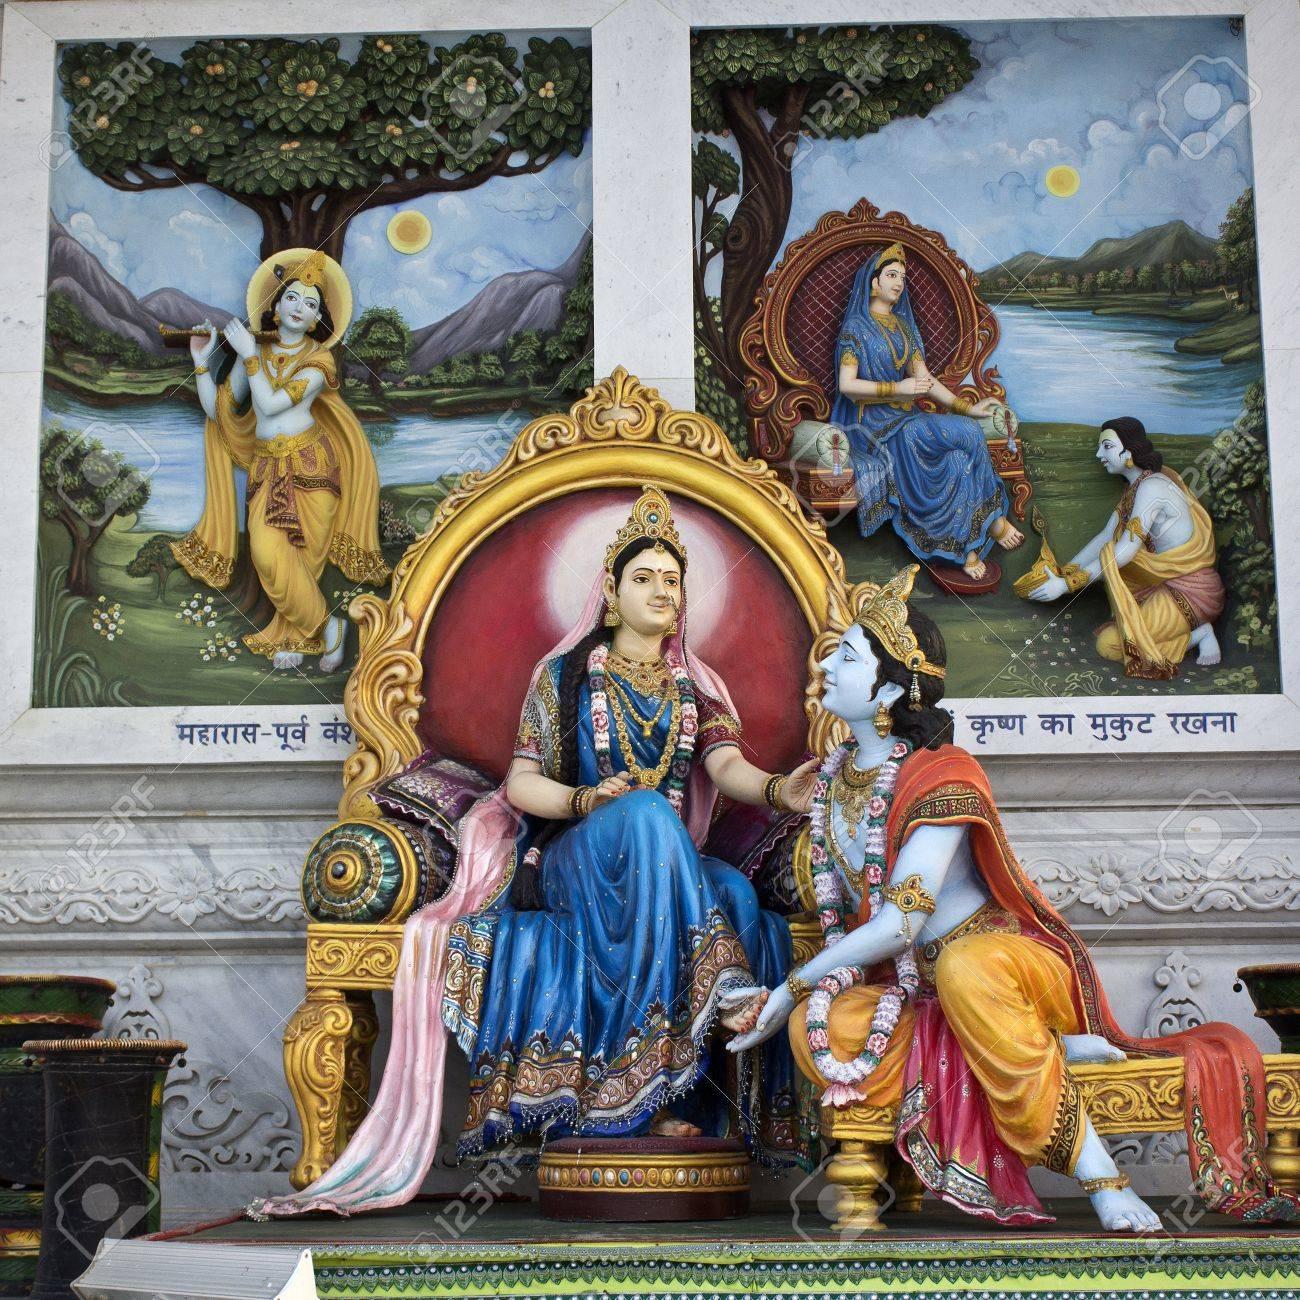 35493707 march 2 2014 vrindavan uttar pradesh india sculpture of radha and krishna close to prem mandir or te